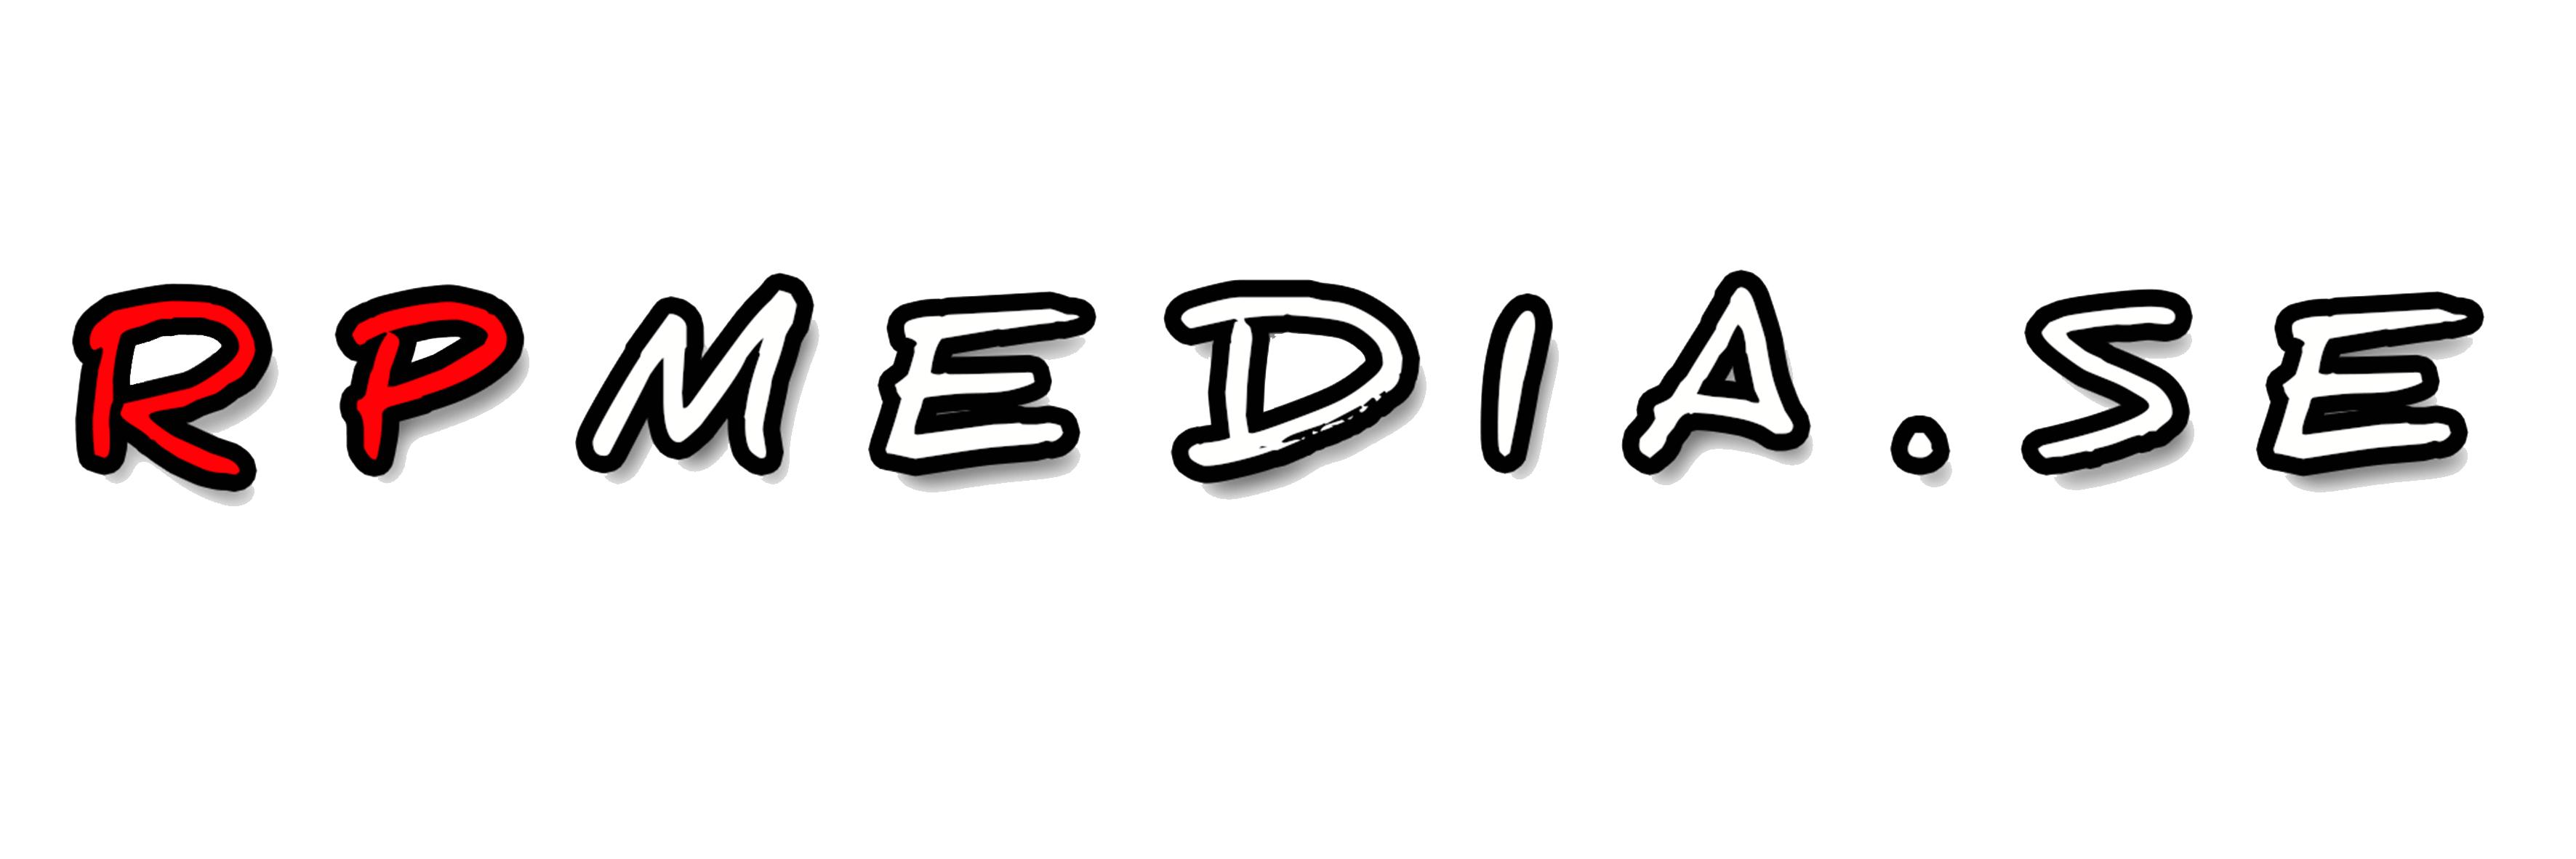 Rpmedia.se